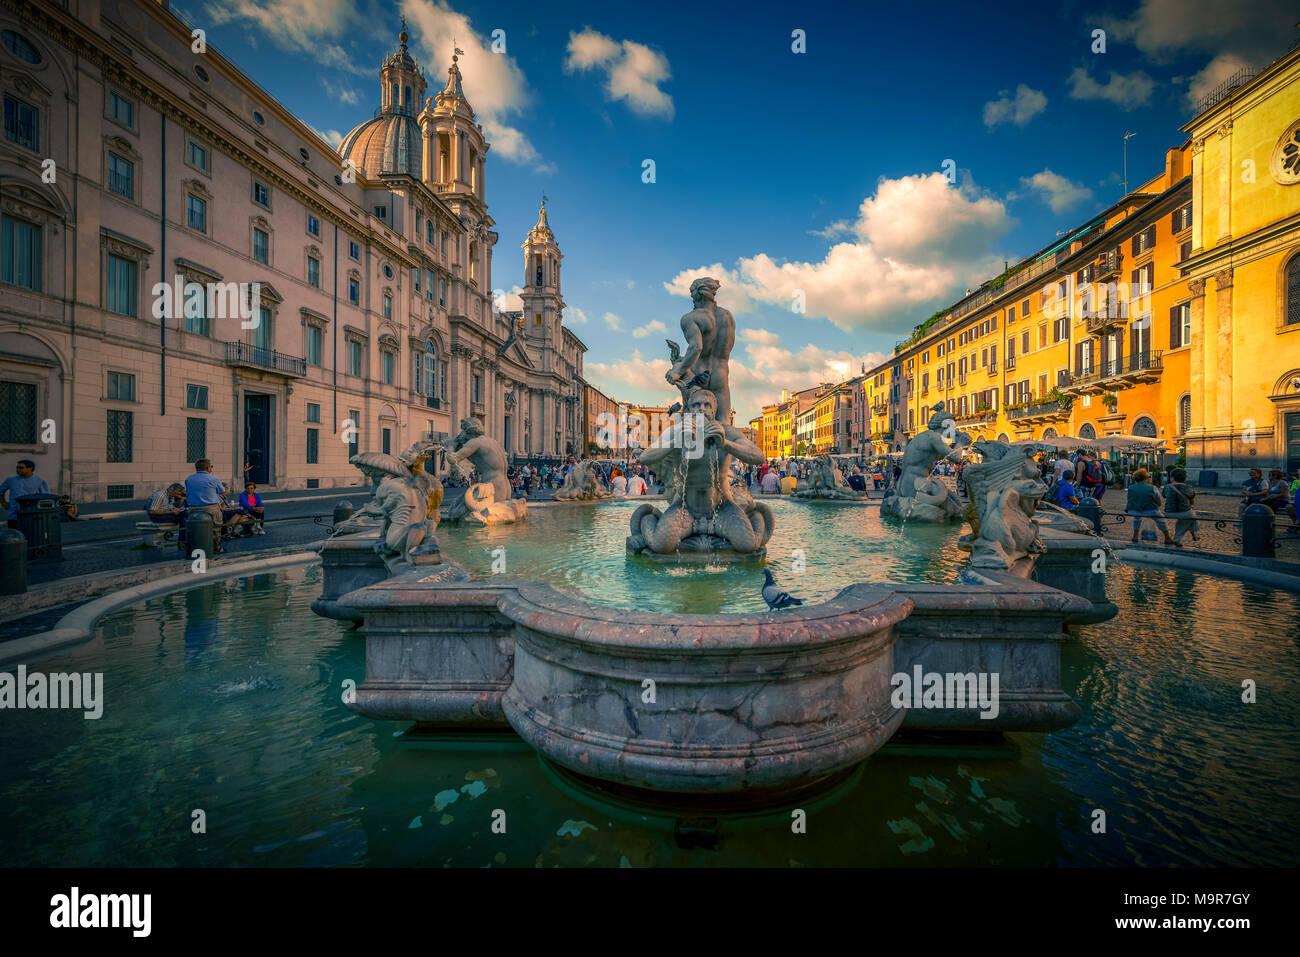 Europa, Italien, Rom, Platz, Piazza Navona - Stock Image